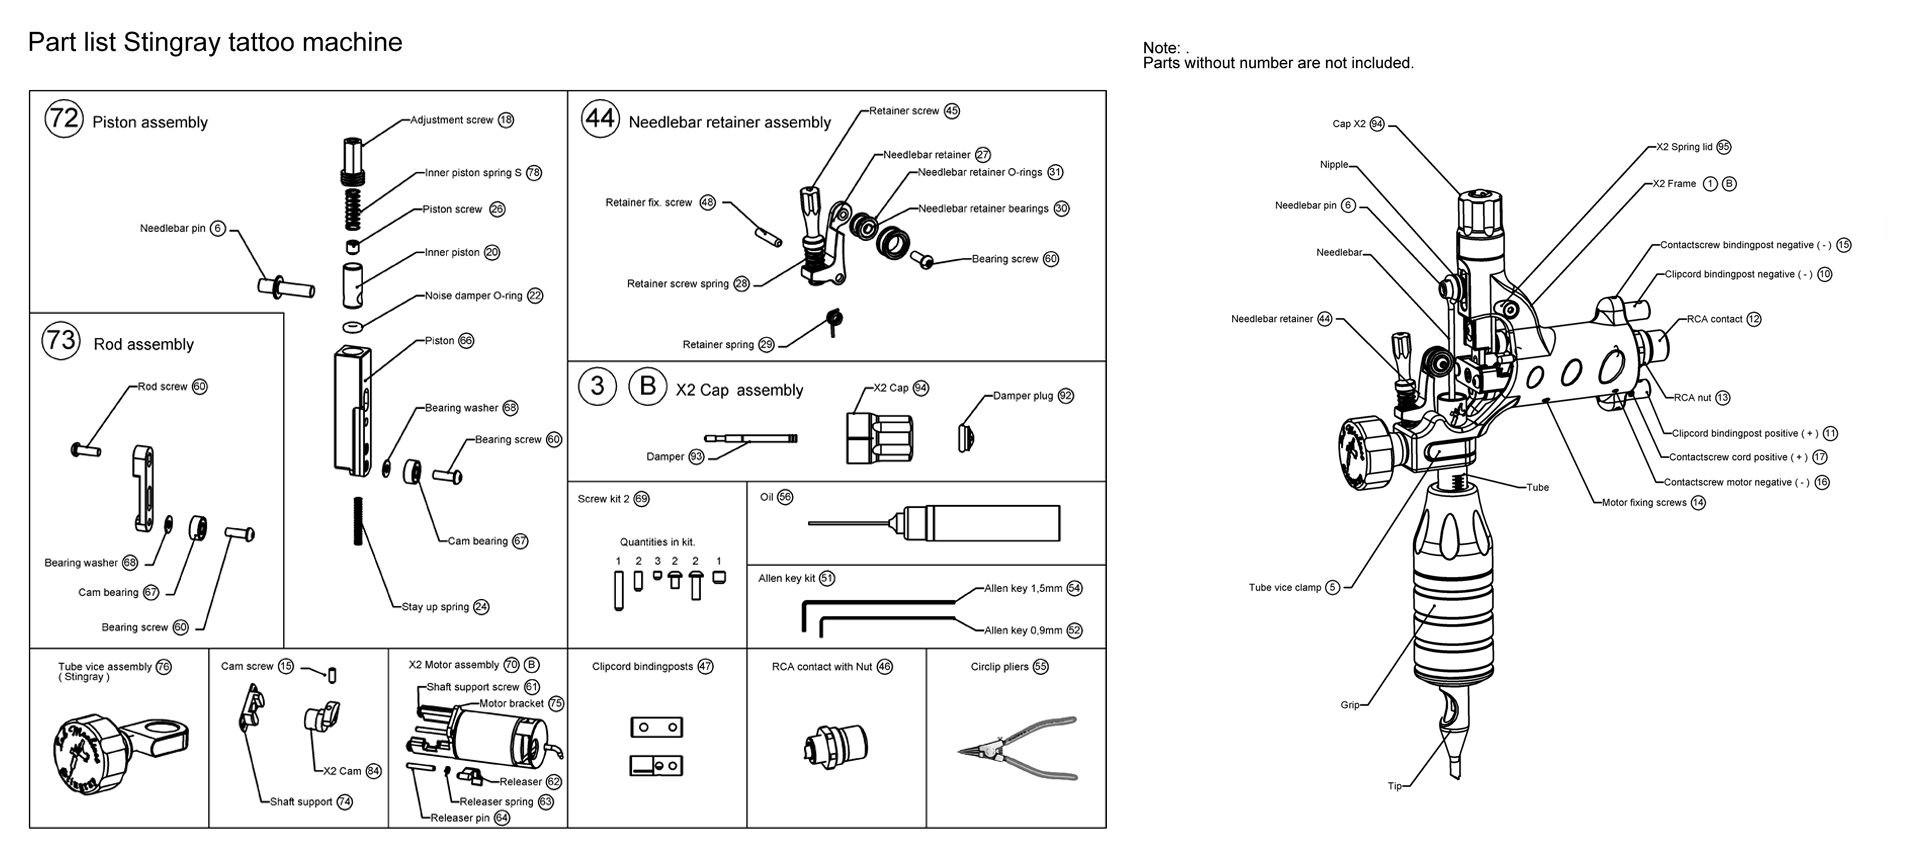 Tattoo Machine Wiring Diagram Power Supply Spare Parts Inkmachines Symbols Free Diagrams Dimension 1920